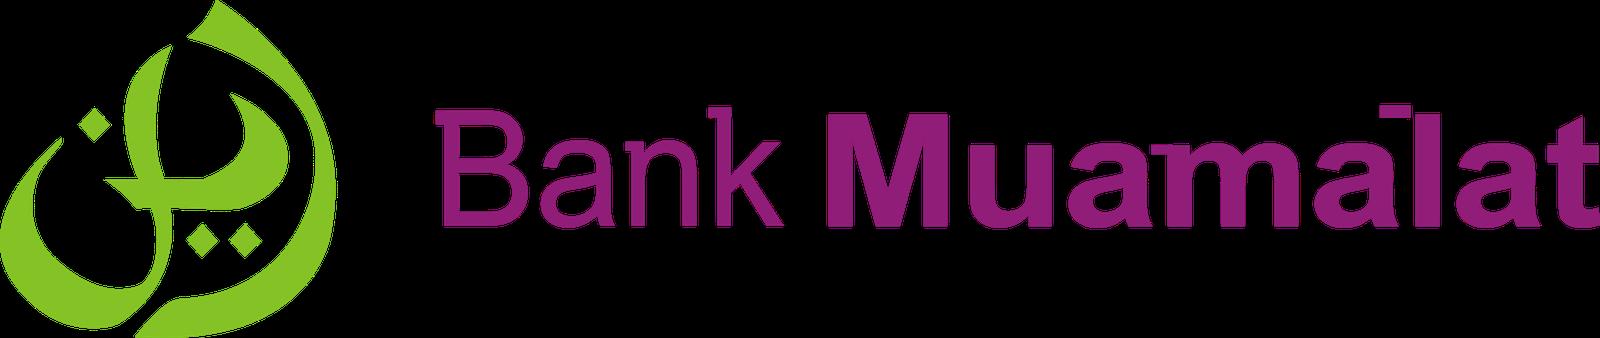 logo baru bank muamalat logo baru bank muamalat